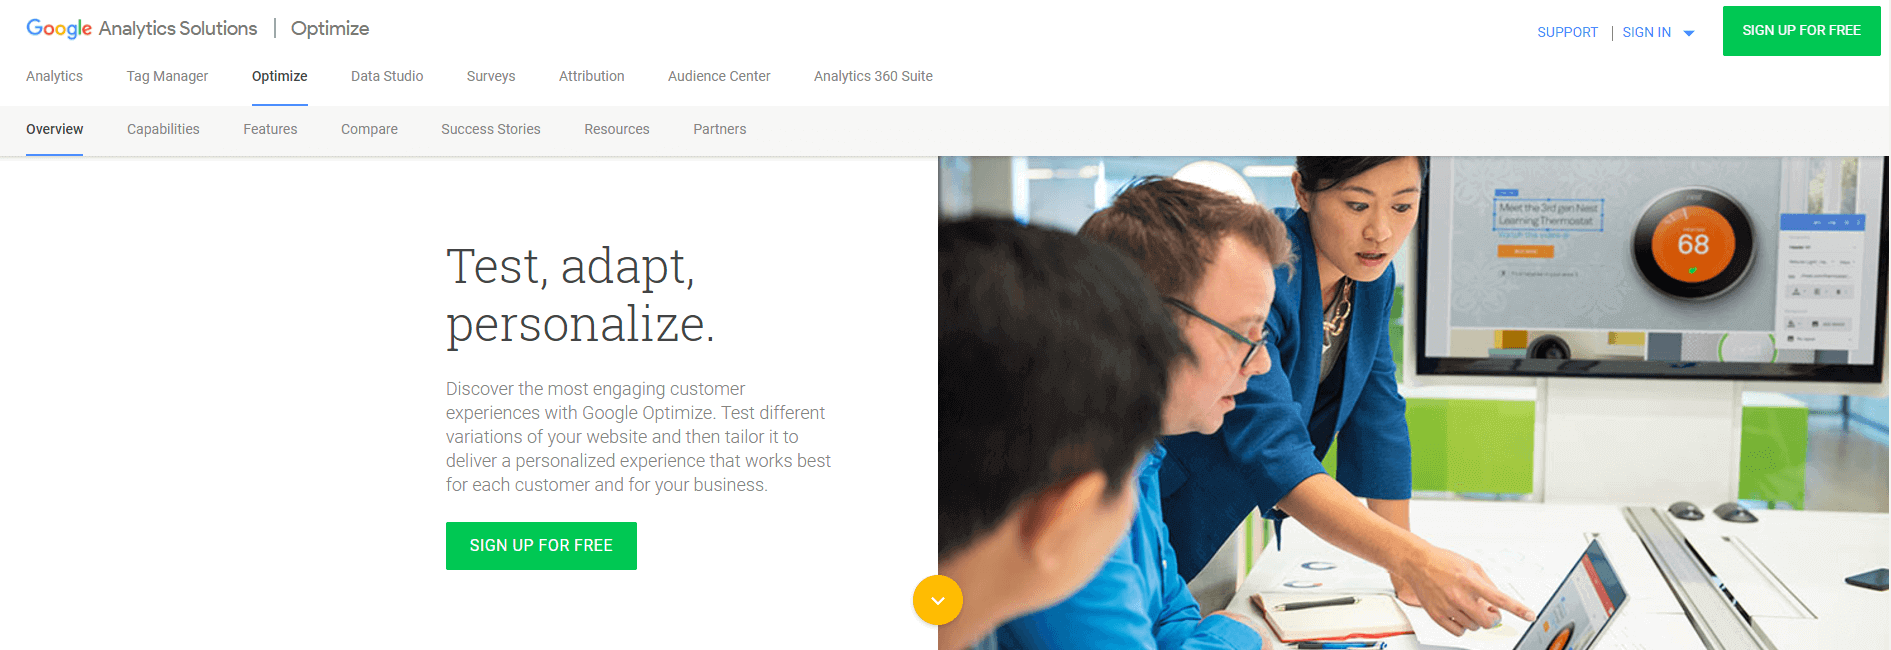 Google-Optimize-Anmeldung